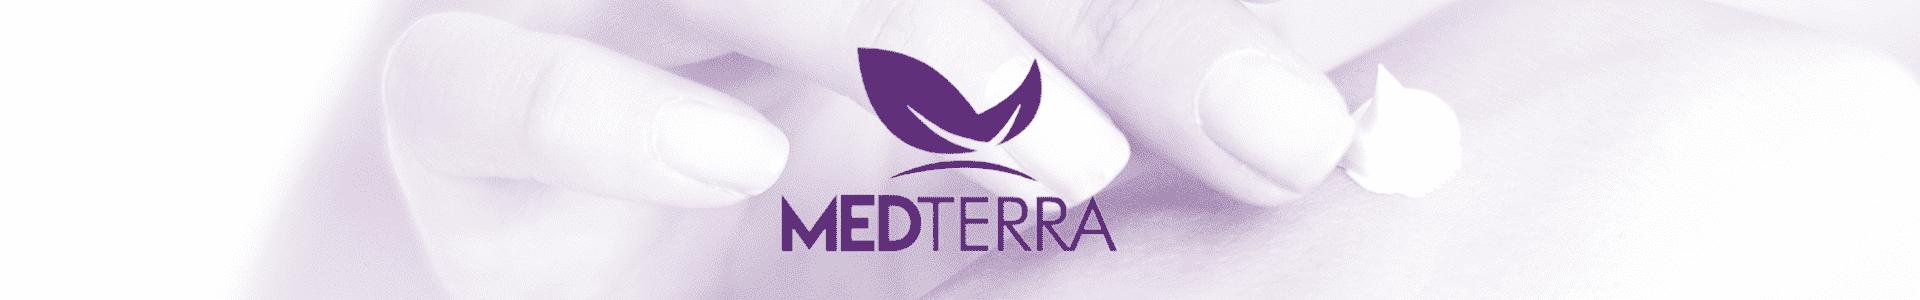 Buy Medterra CBD Online